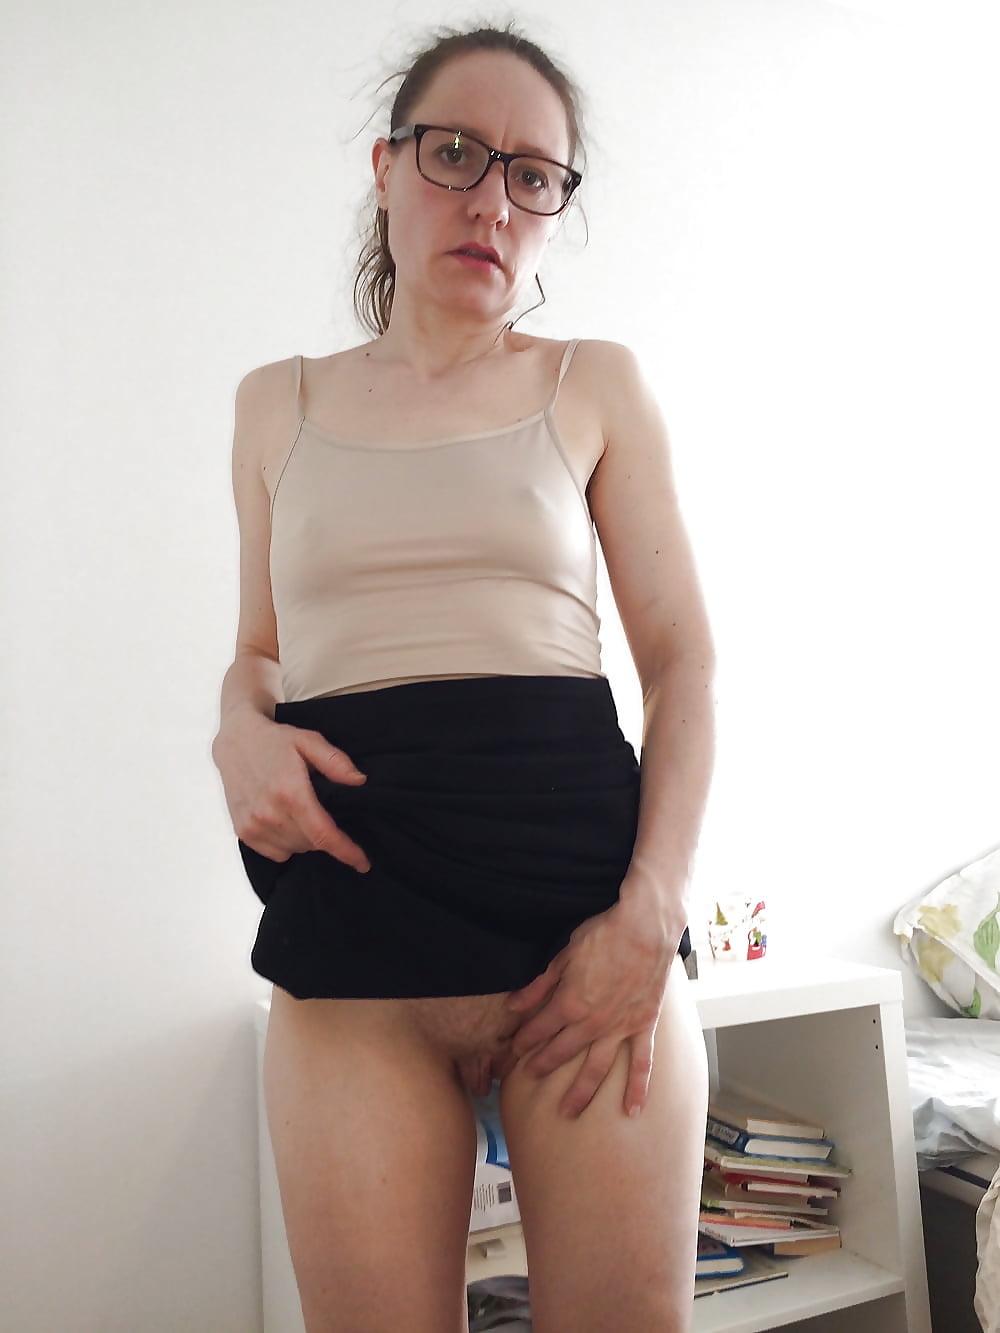 Hairy skinny pics